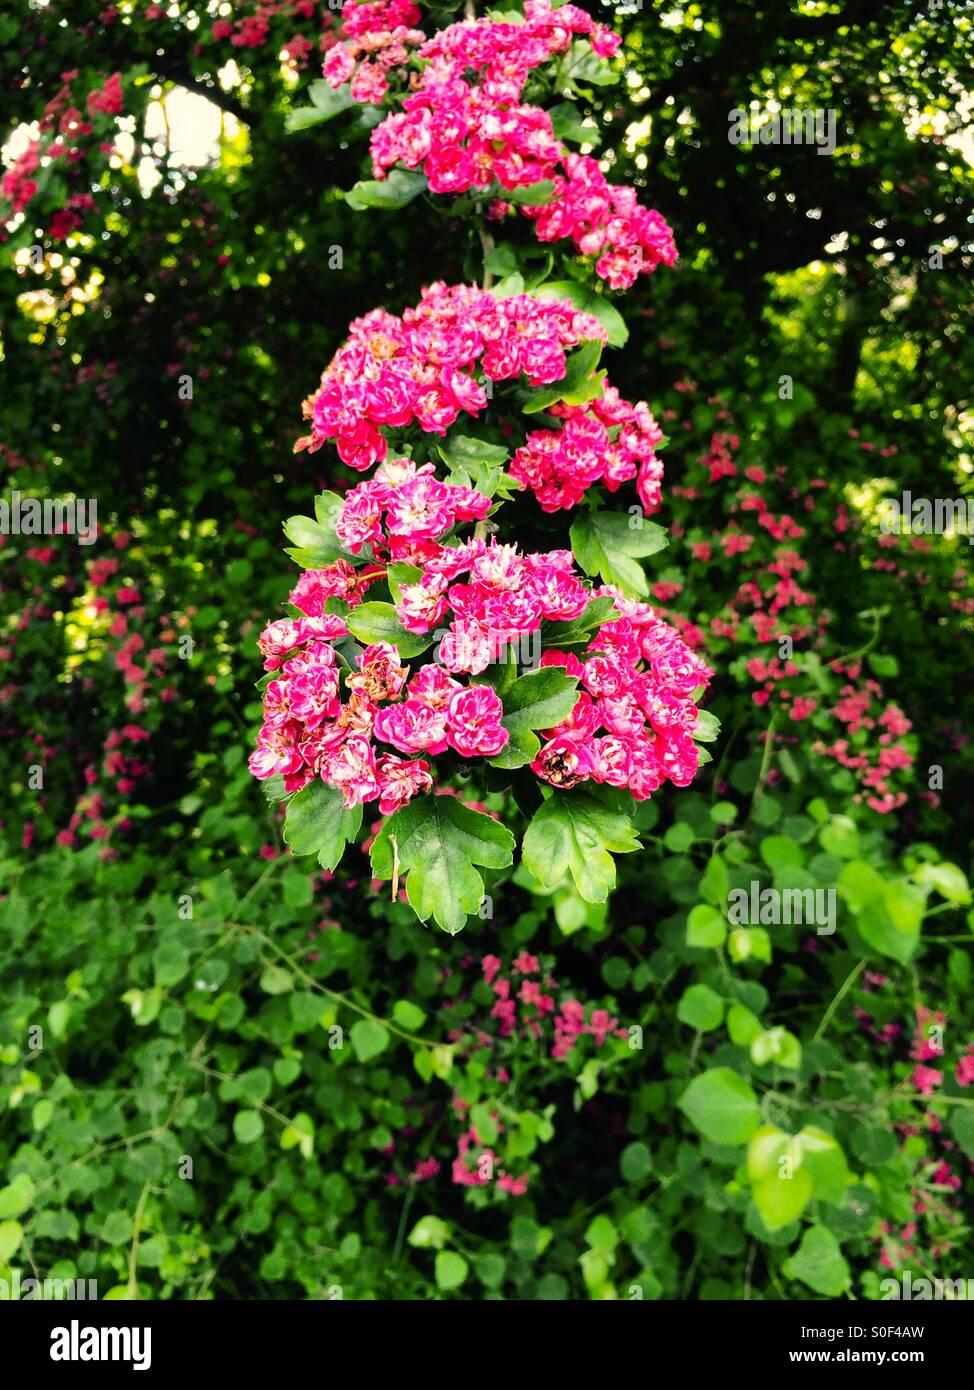 Flowering Hawthorn Tree - Stock Image